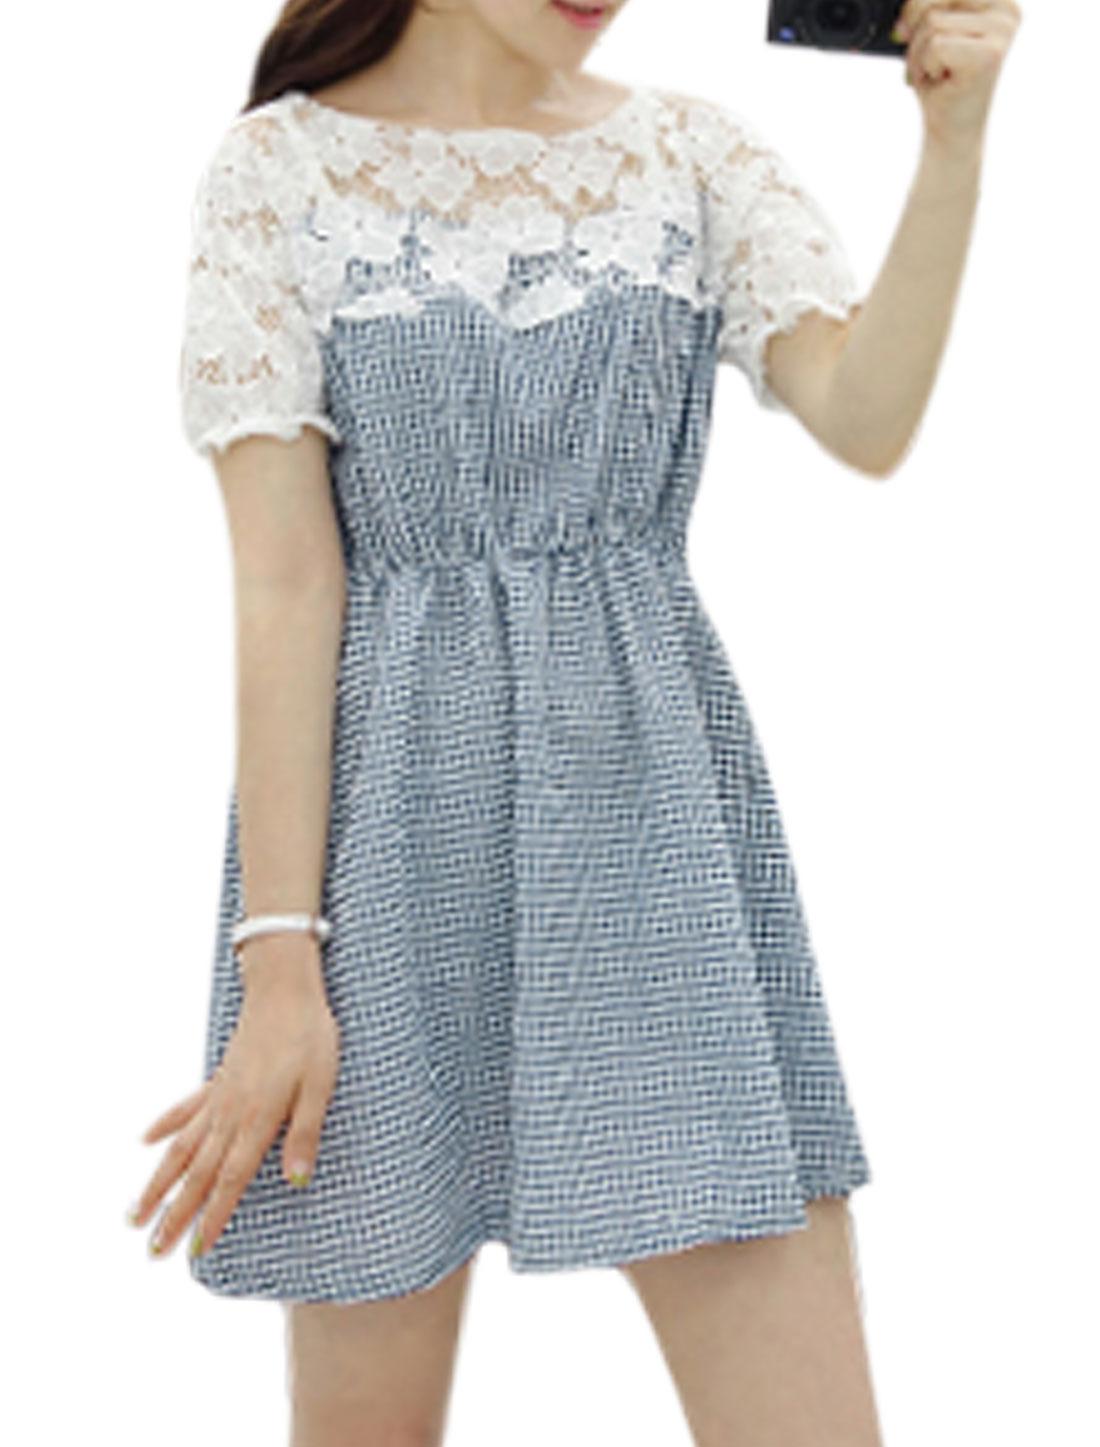 Ladies Short Sleeve Round Neck Plaids Crochet Hollow Out Dress Navy Blue S